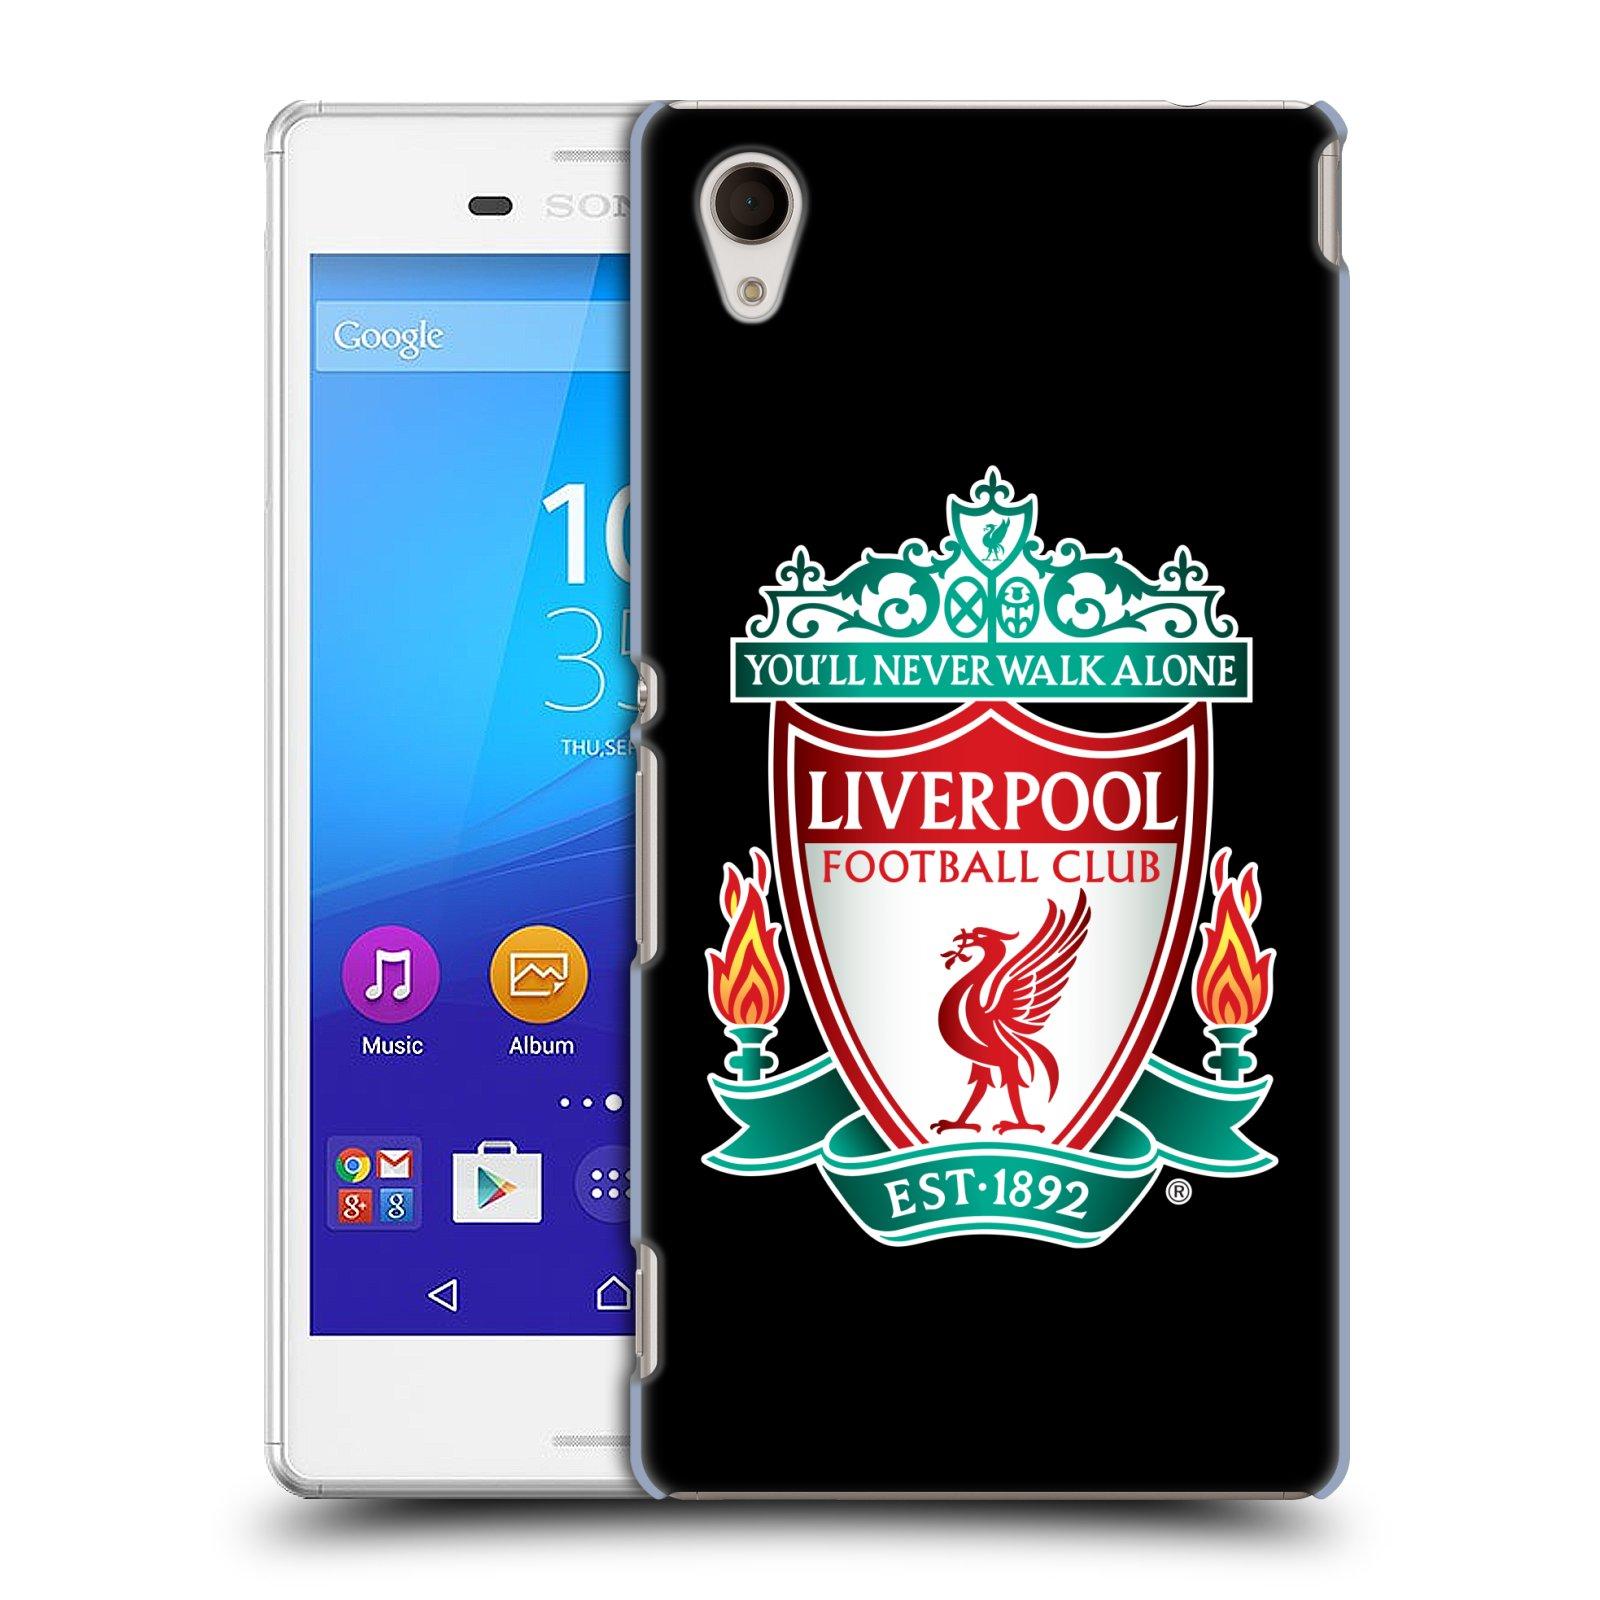 Plastové pouzdro na mobil Sony Xperia M4 Aqua E2303 HEAD CASE ZNAK LIVERPOOL FC OFFICIAL BLACK (Kryt či obal na mobilní telefon Liverpool FC Official pro Sony Xperia M4 Aqua a M4 Aqua Dual SIM)